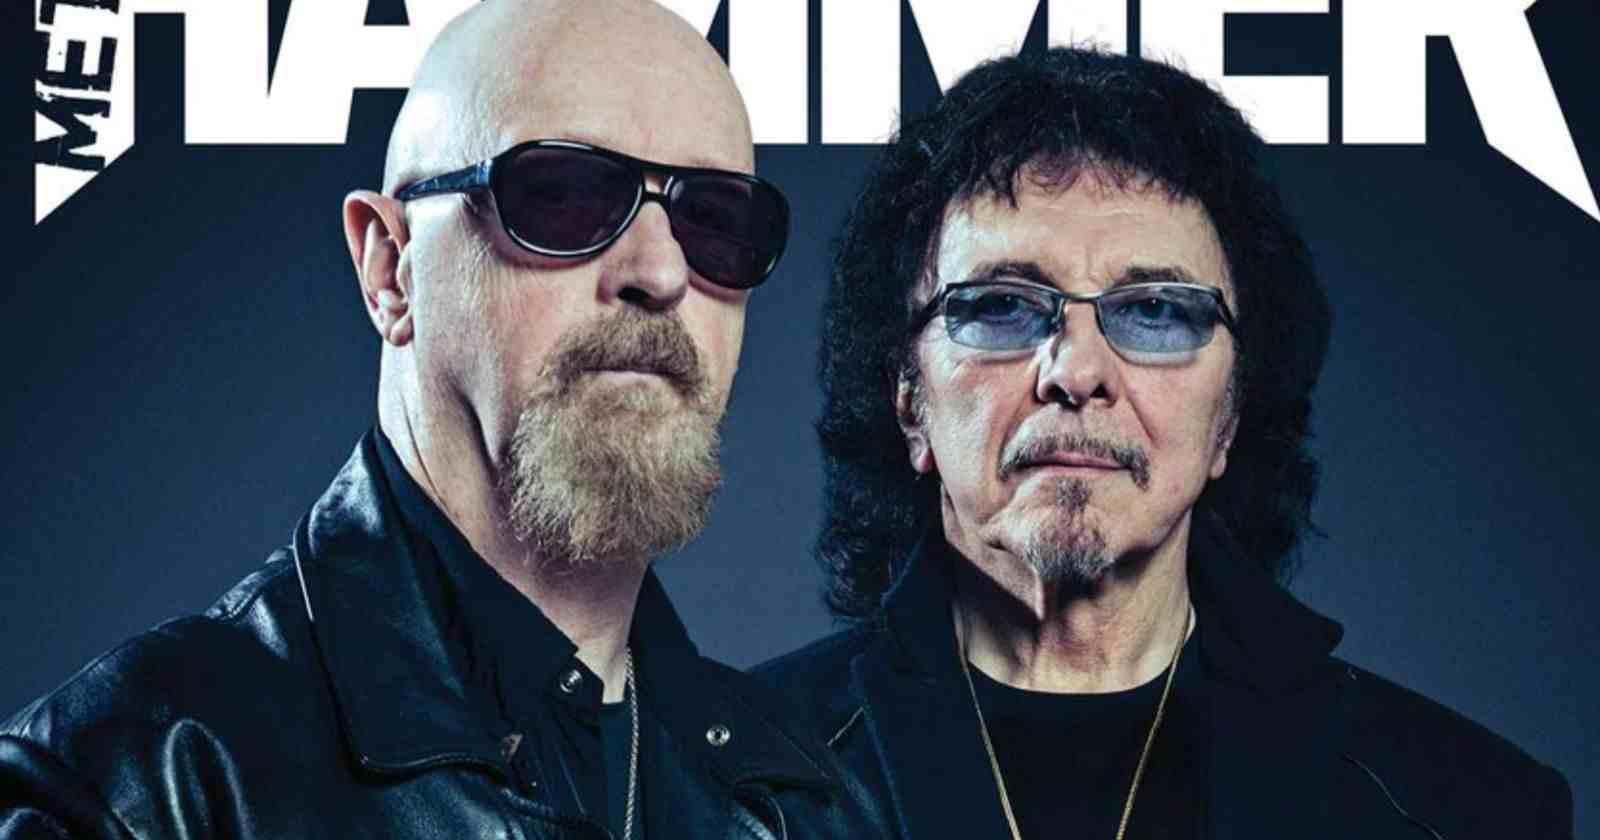 Rob Halford Tony Iommi